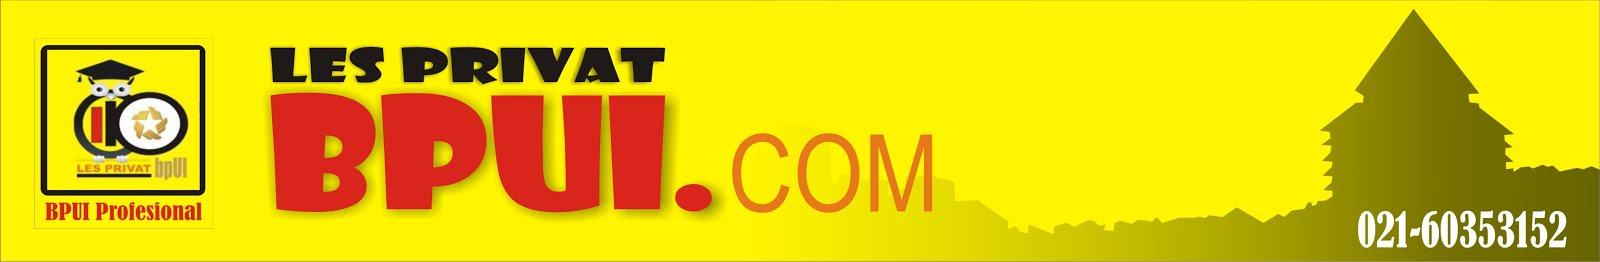 BPUI | BIMBEL PRIVAT UI | Les Privat bpUI | Guru Les Privat , Super Intensif UN ,Supercamp UI